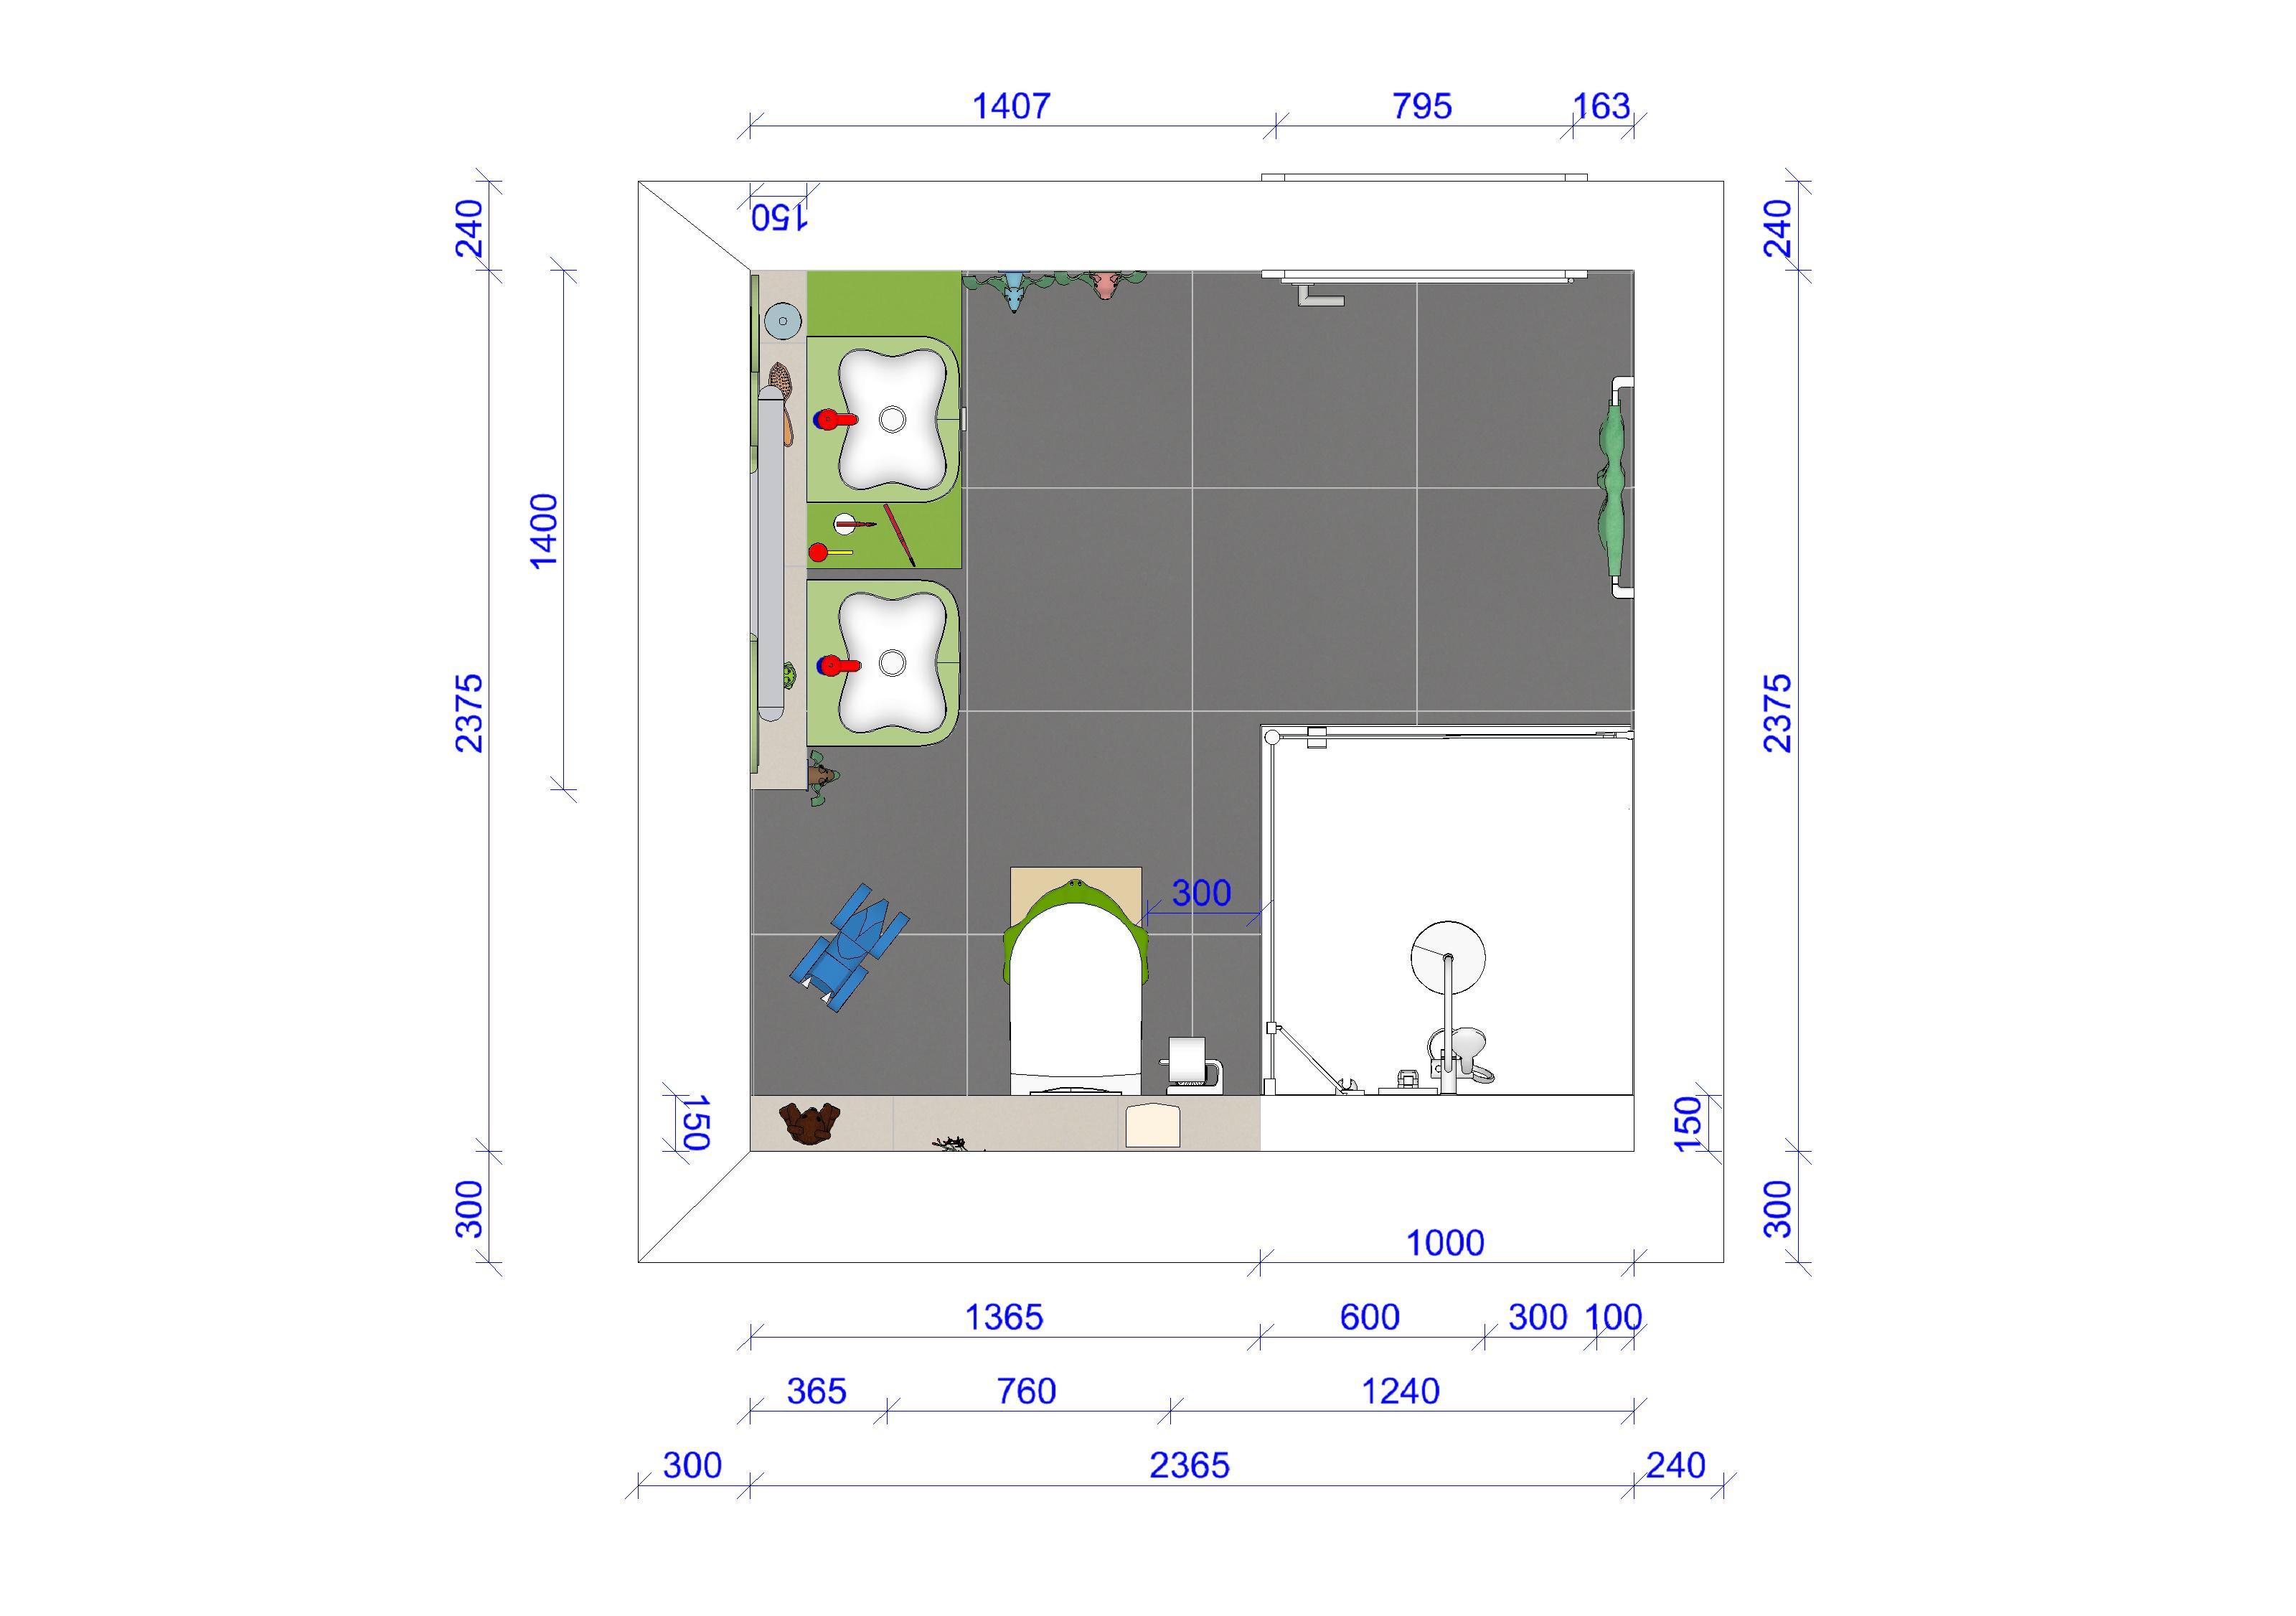 Grundriss Kinderbadezimmer #badezimmer #badezimmergrundriss  ©www.mlb Badplanung.de